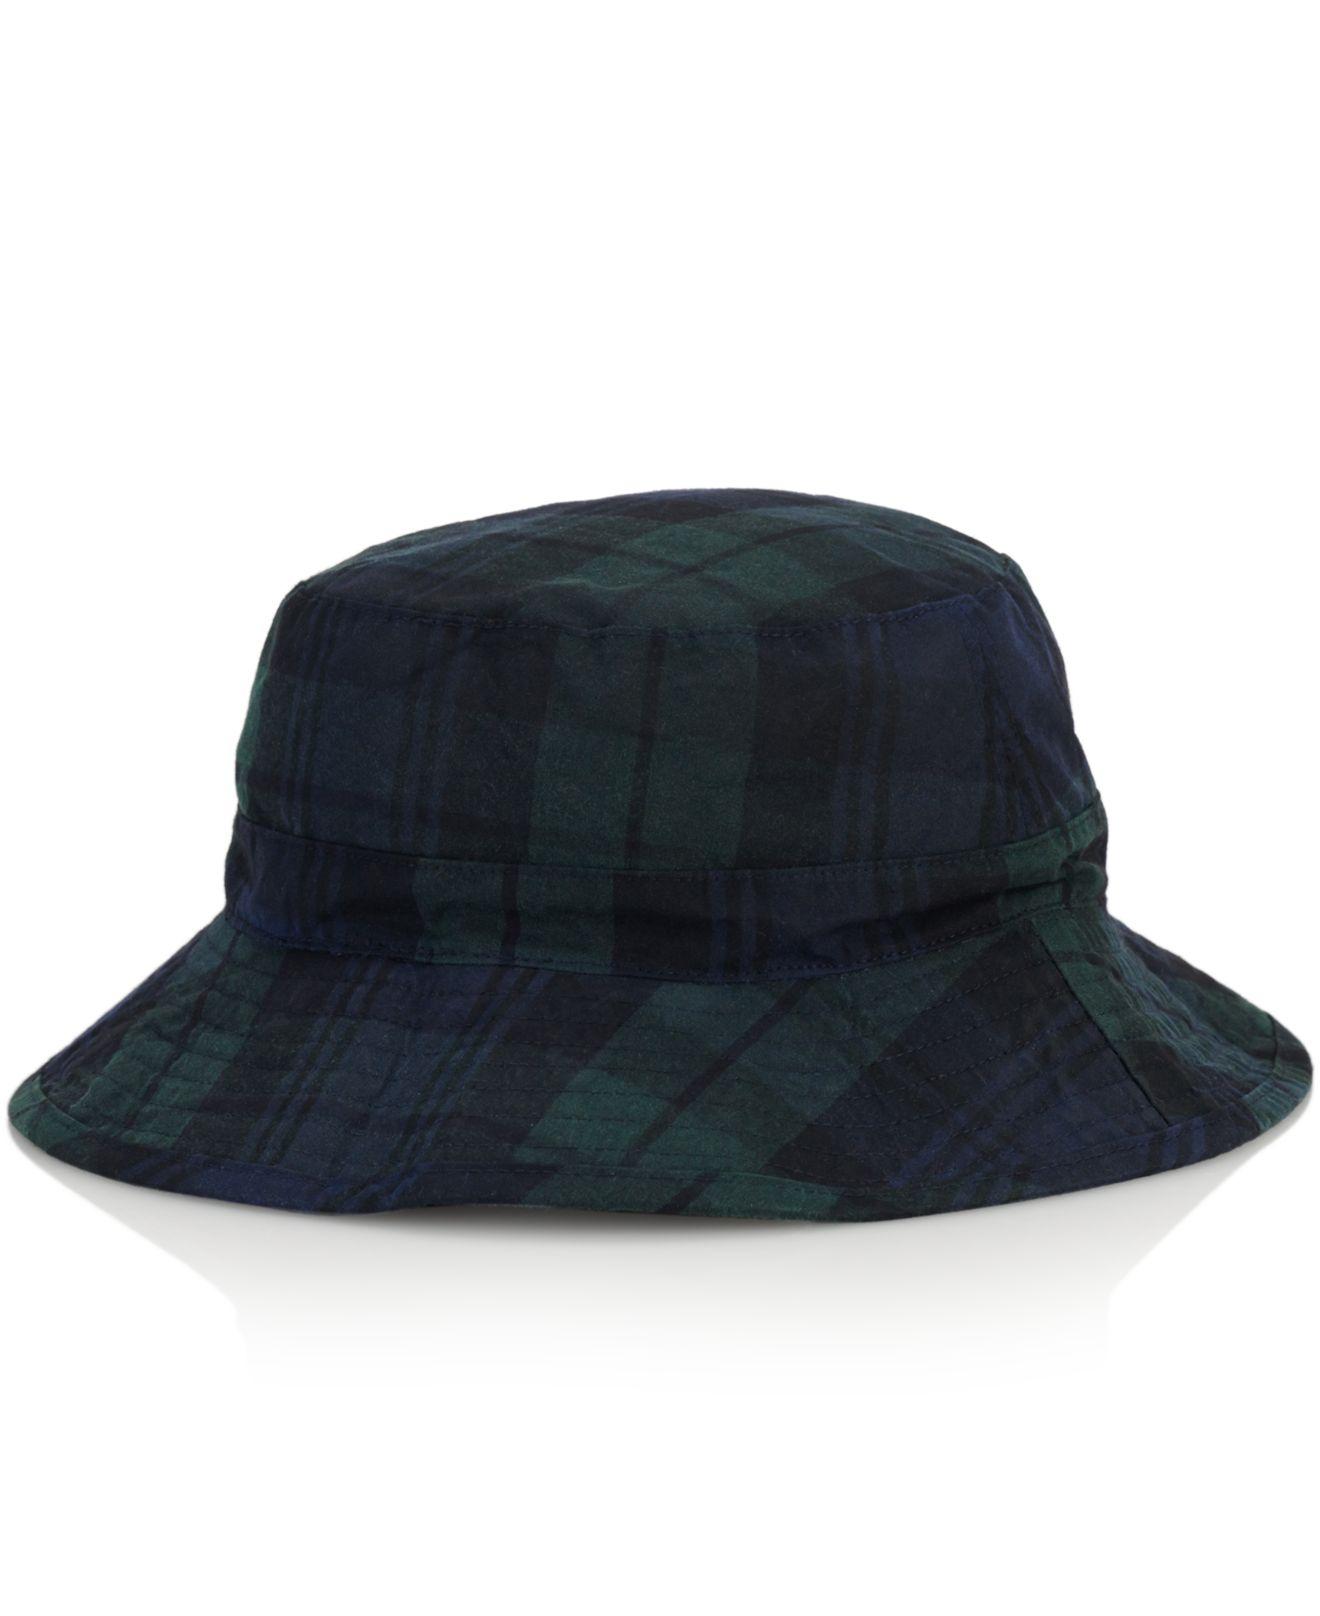 c18ffd0e368 Polo Ralph Lauren Tartan Oilcloth Bucket Hat in Black for .